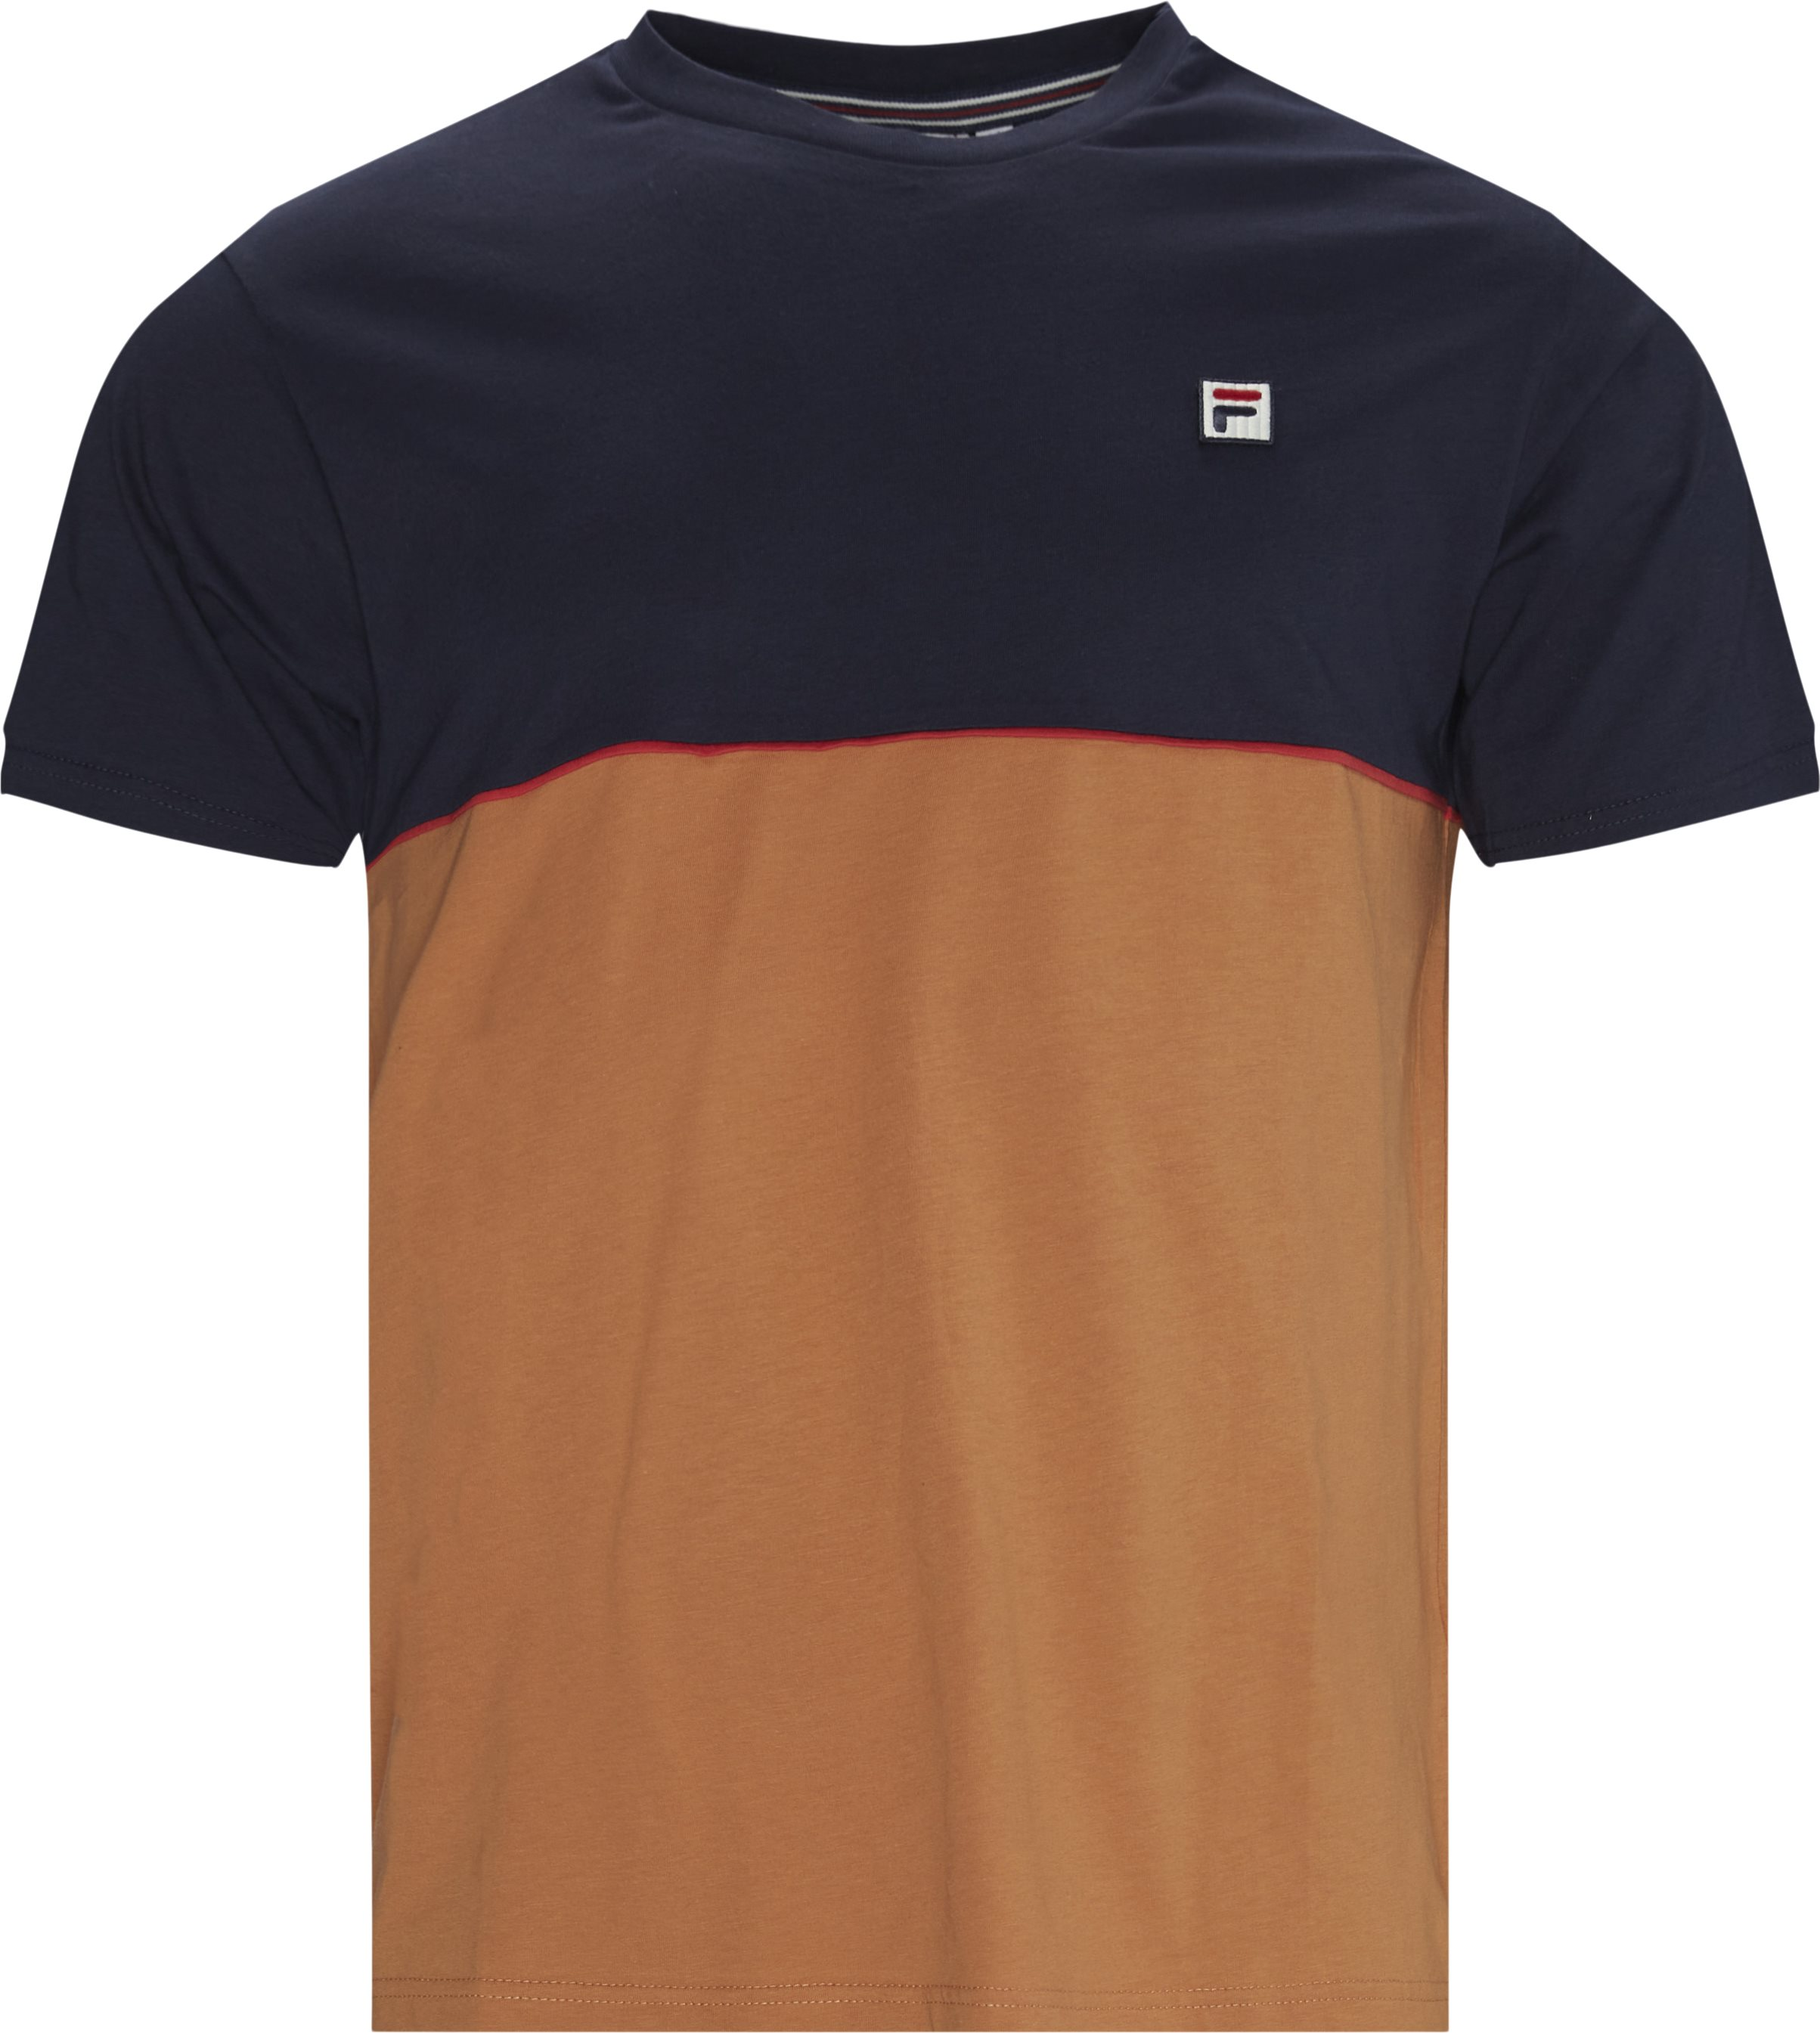 Havard Tee - T-shirts - Regular fit - Blå